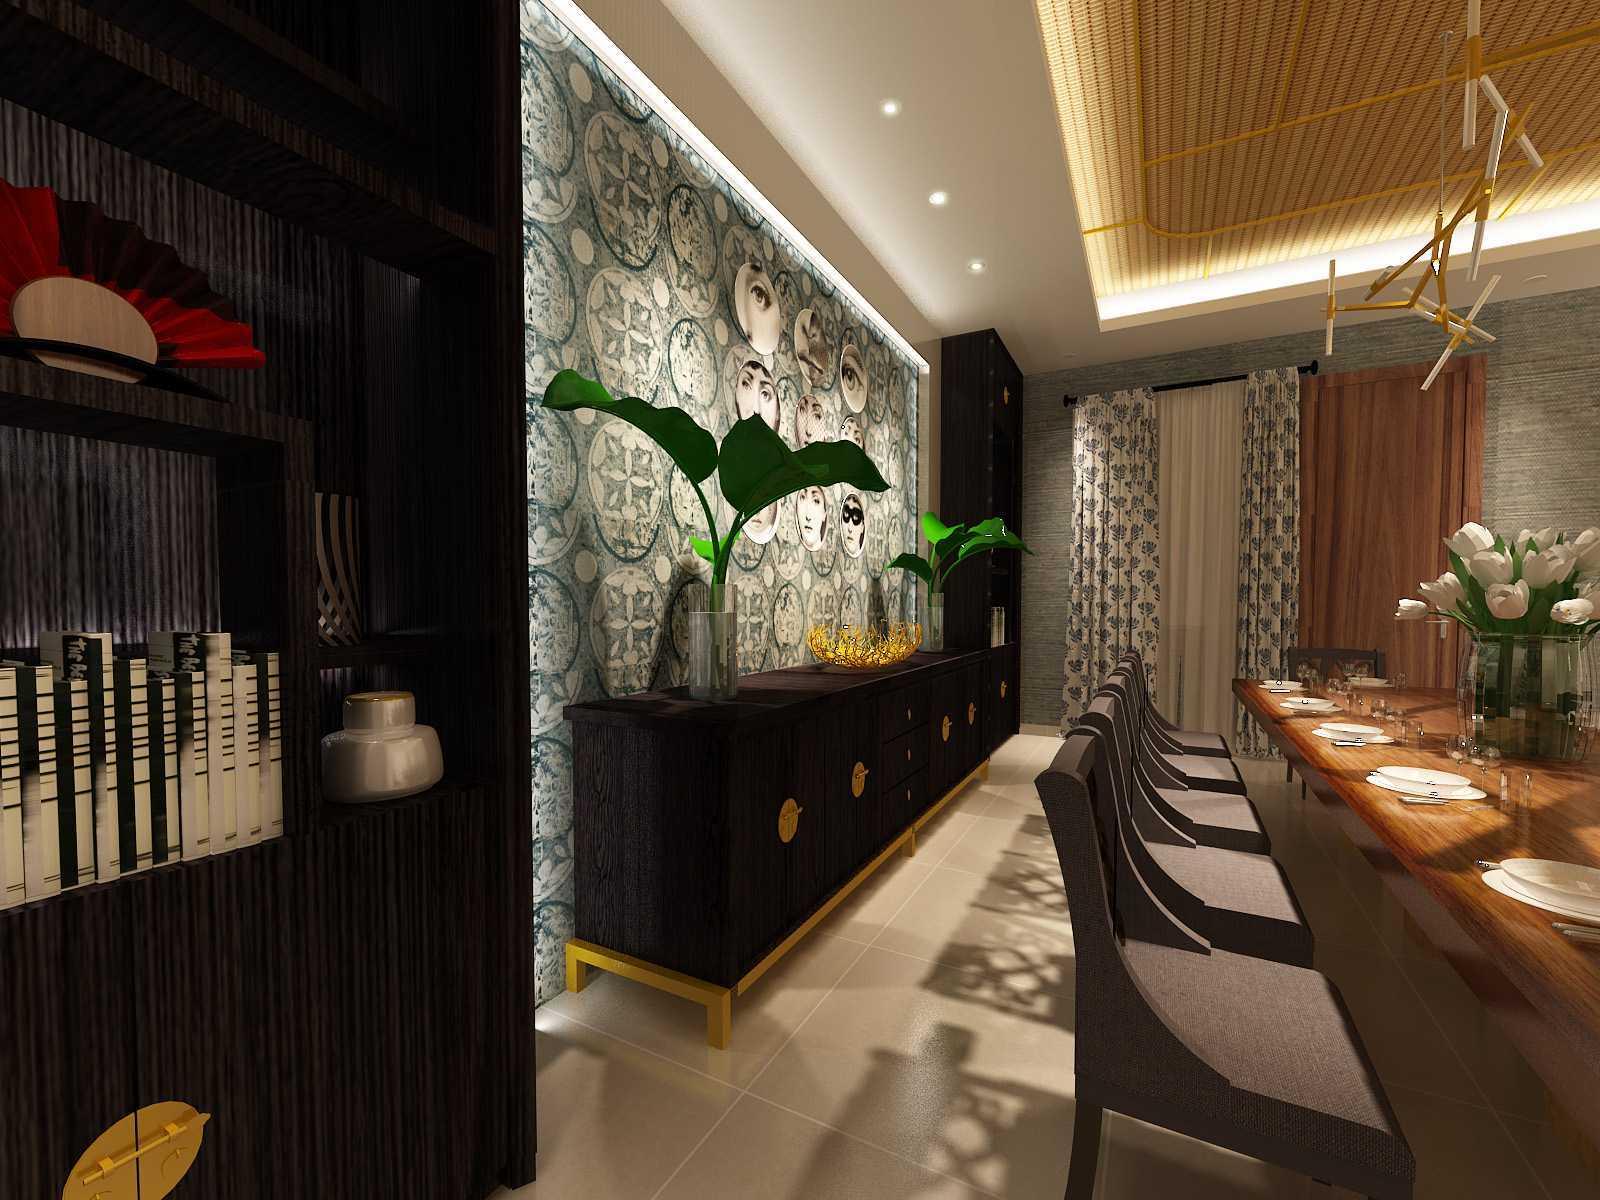 Koerie Design Vgi Residence Blok, Jl. Bgr. Boulevard Blok A2 No.3A, Rt.6/rw.14, West Kelapa Gading, Kelapa Gading, North Jakarta City, Jakarta 14240, Indonesia Blok, Jl. Bgr. Boulevard Blok A2 No.3A, Rt.6/rw.14, West Kelapa Gading, Kelapa Gading, North Jakarta City, Jakarta 14240, Indonesia Dining Room Eklektik  40256